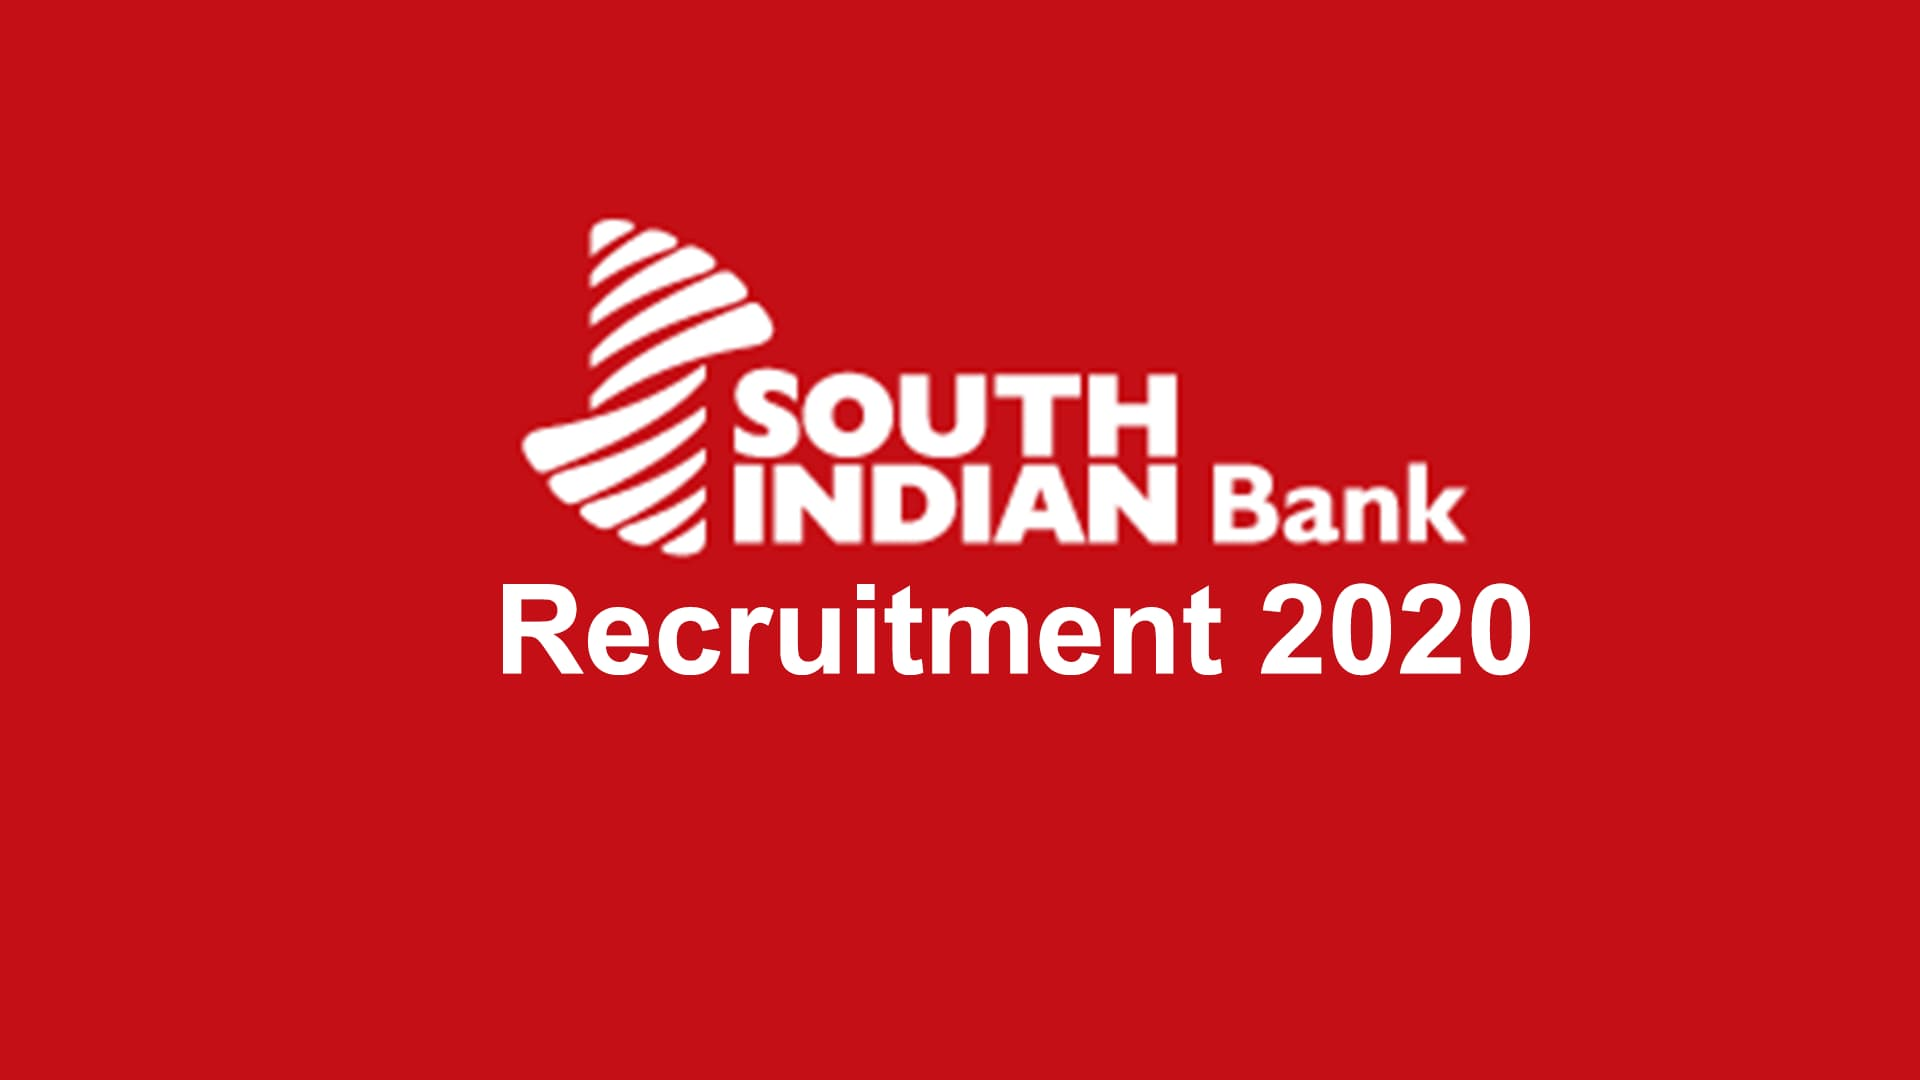 South Indian Bank Recruitment 2020